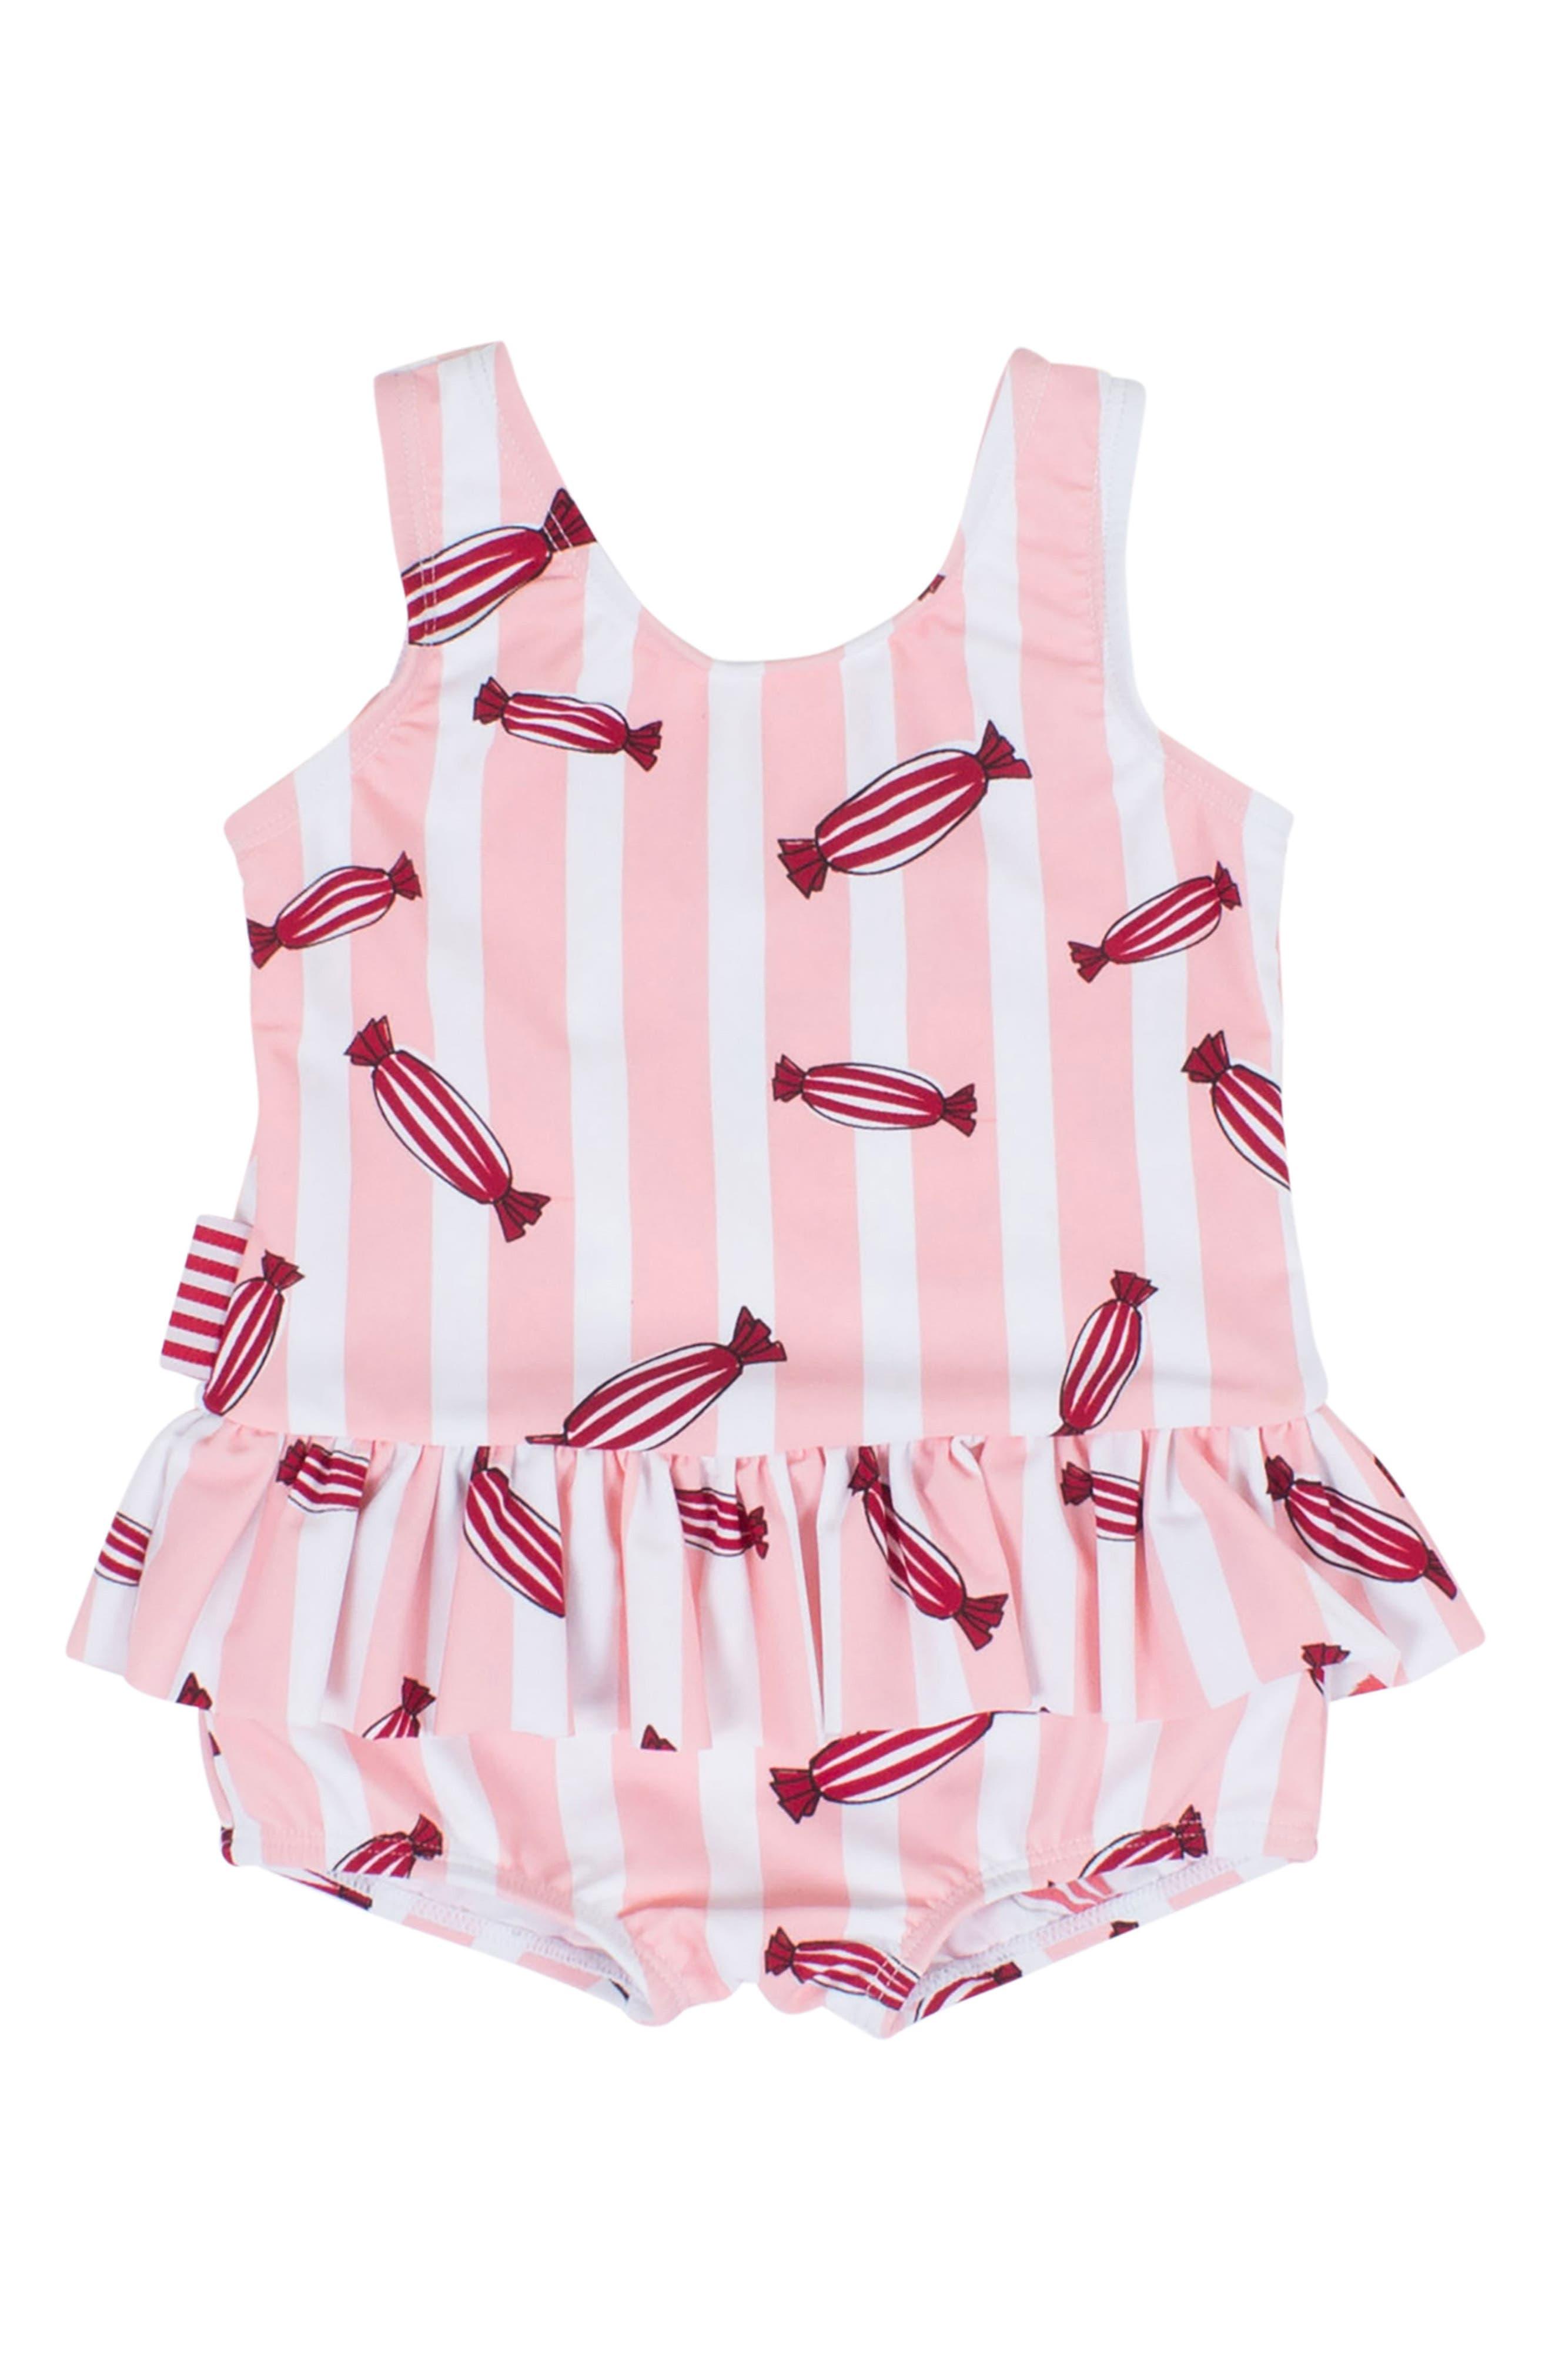 Bonbon Skirted One-Piece Swimsuit,                         Main,                         color, 650